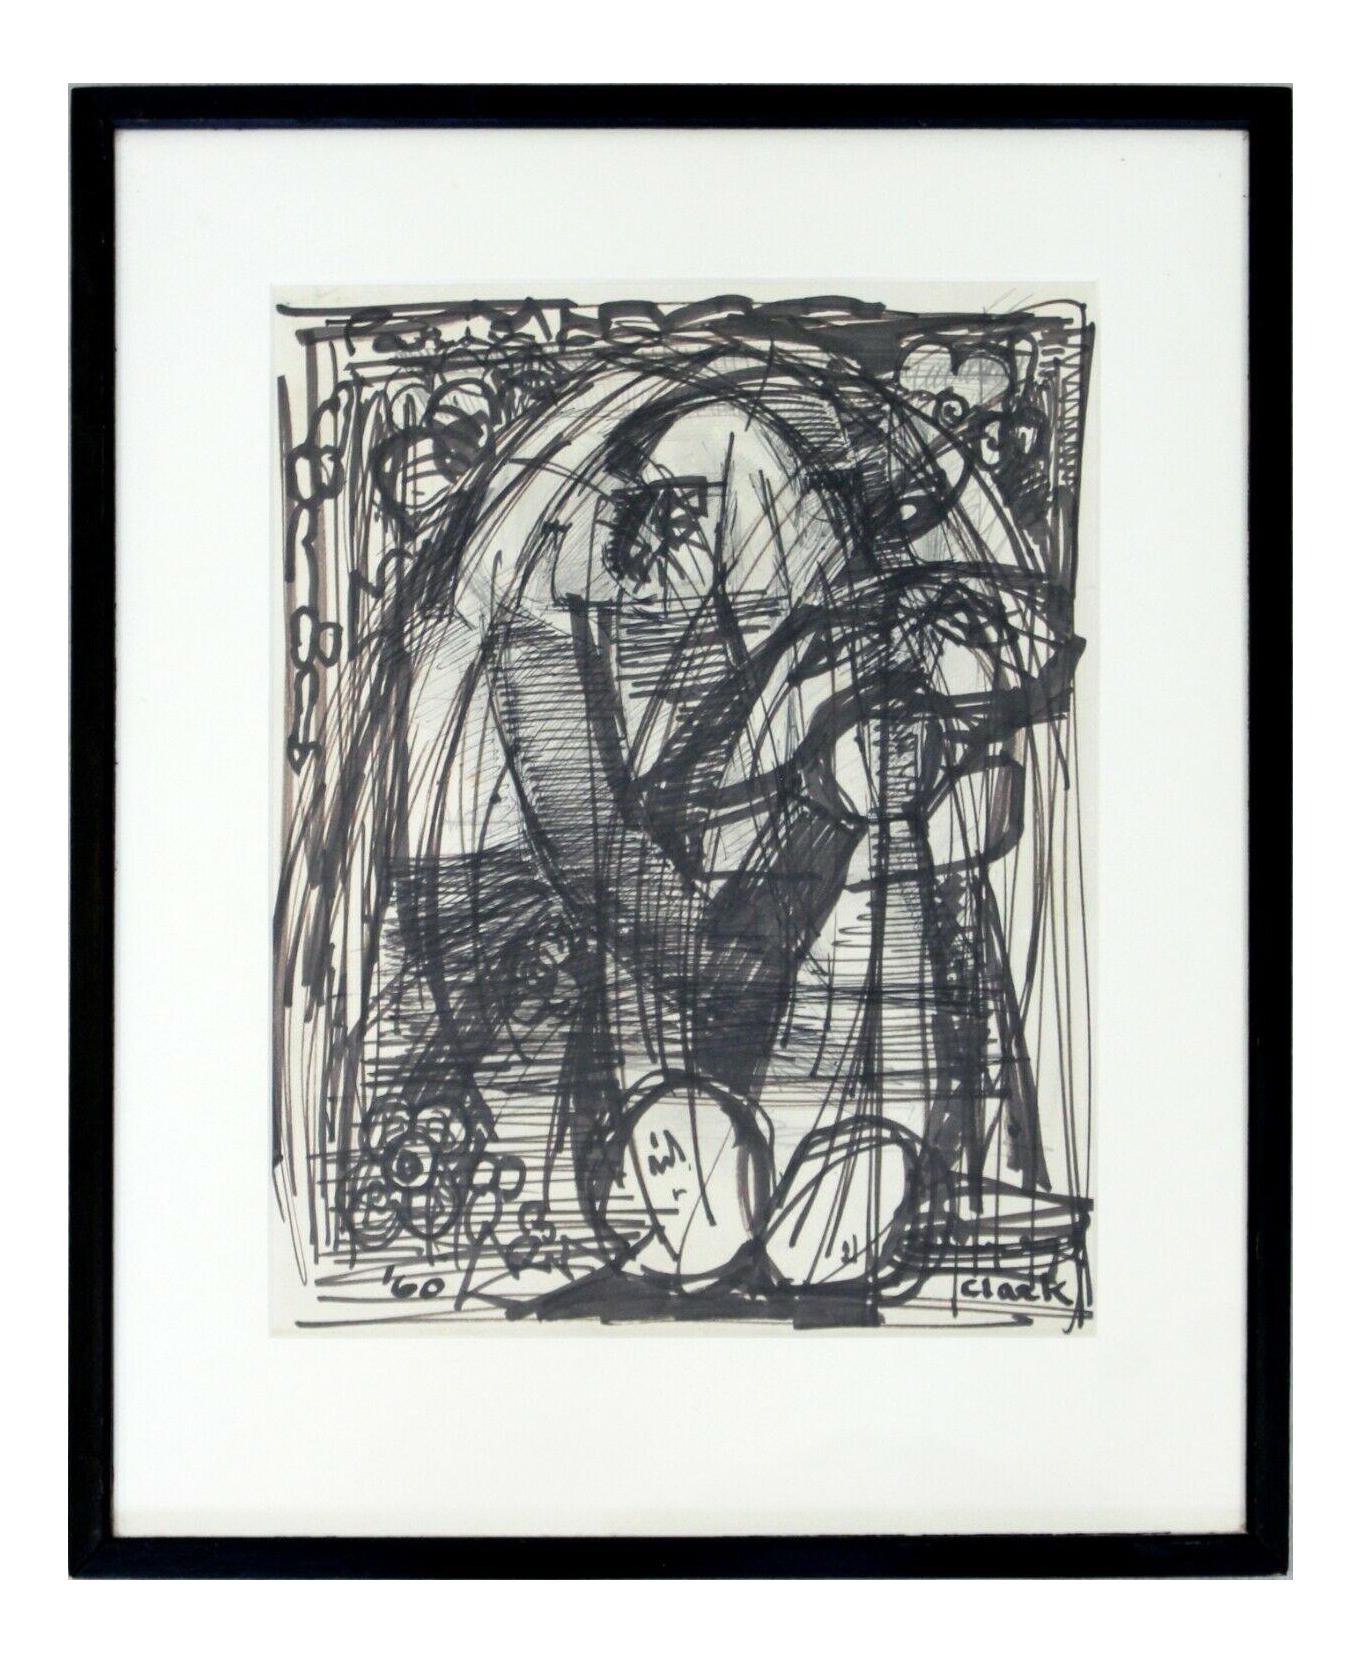 Mid Century Modern Framed Original Abstract Marker Drawing Signed Clark 1960 Chairish